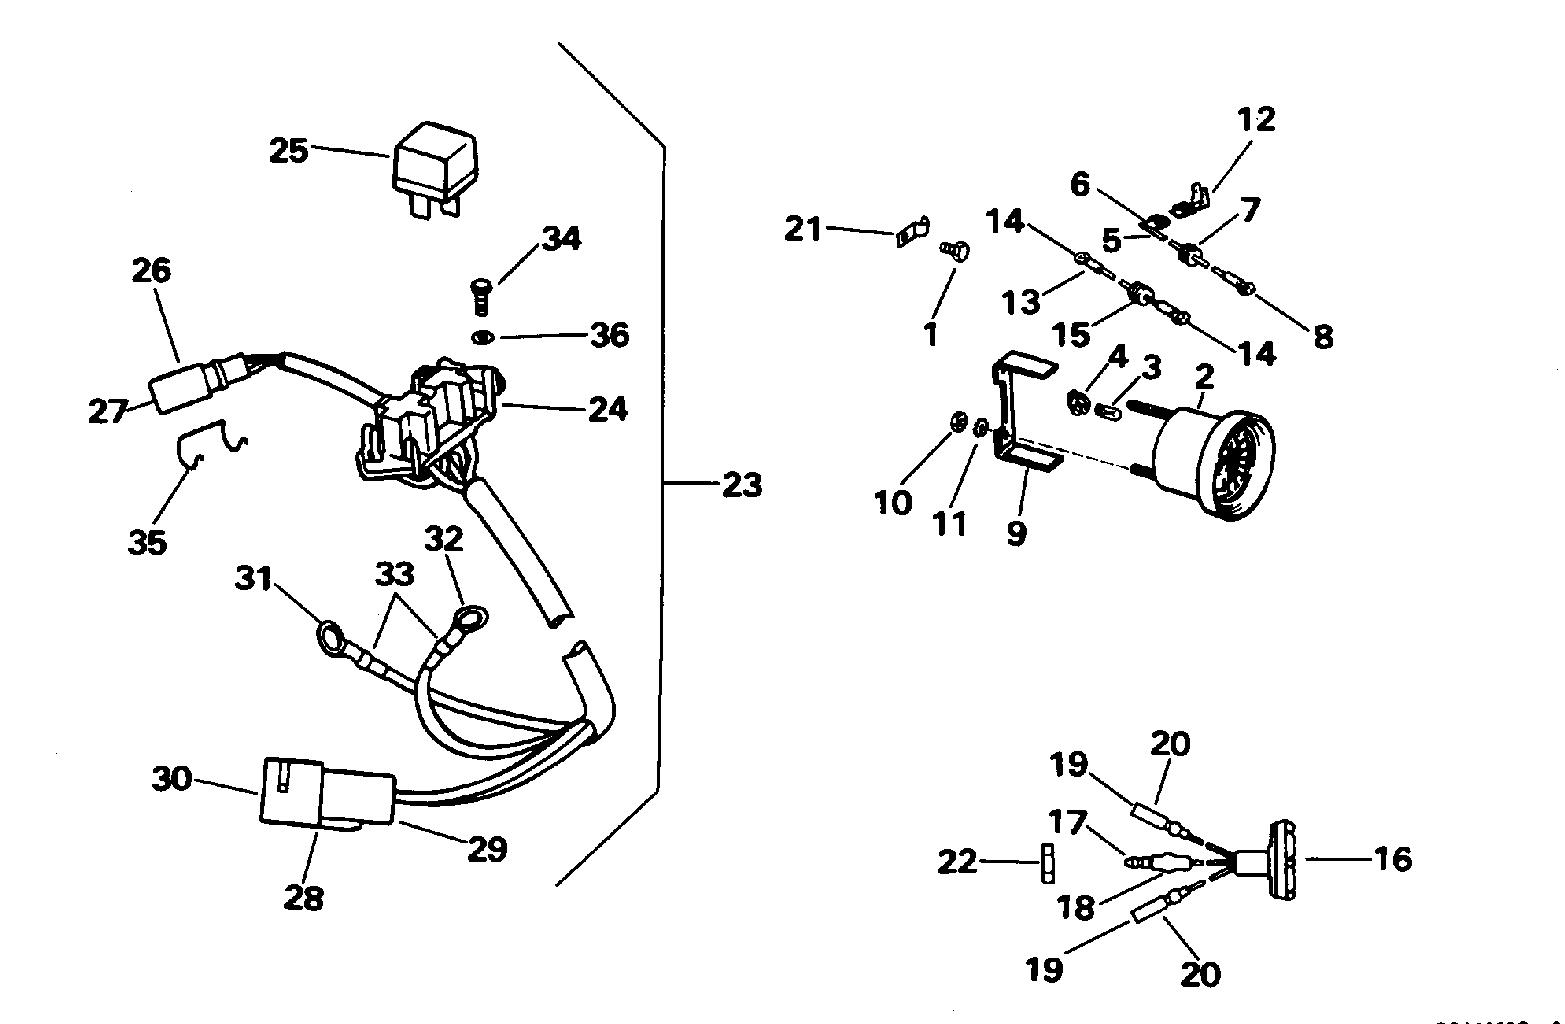 hight resolution of brp evinrude en 1996 35 e35qledc 1996 power trim tilt electrical